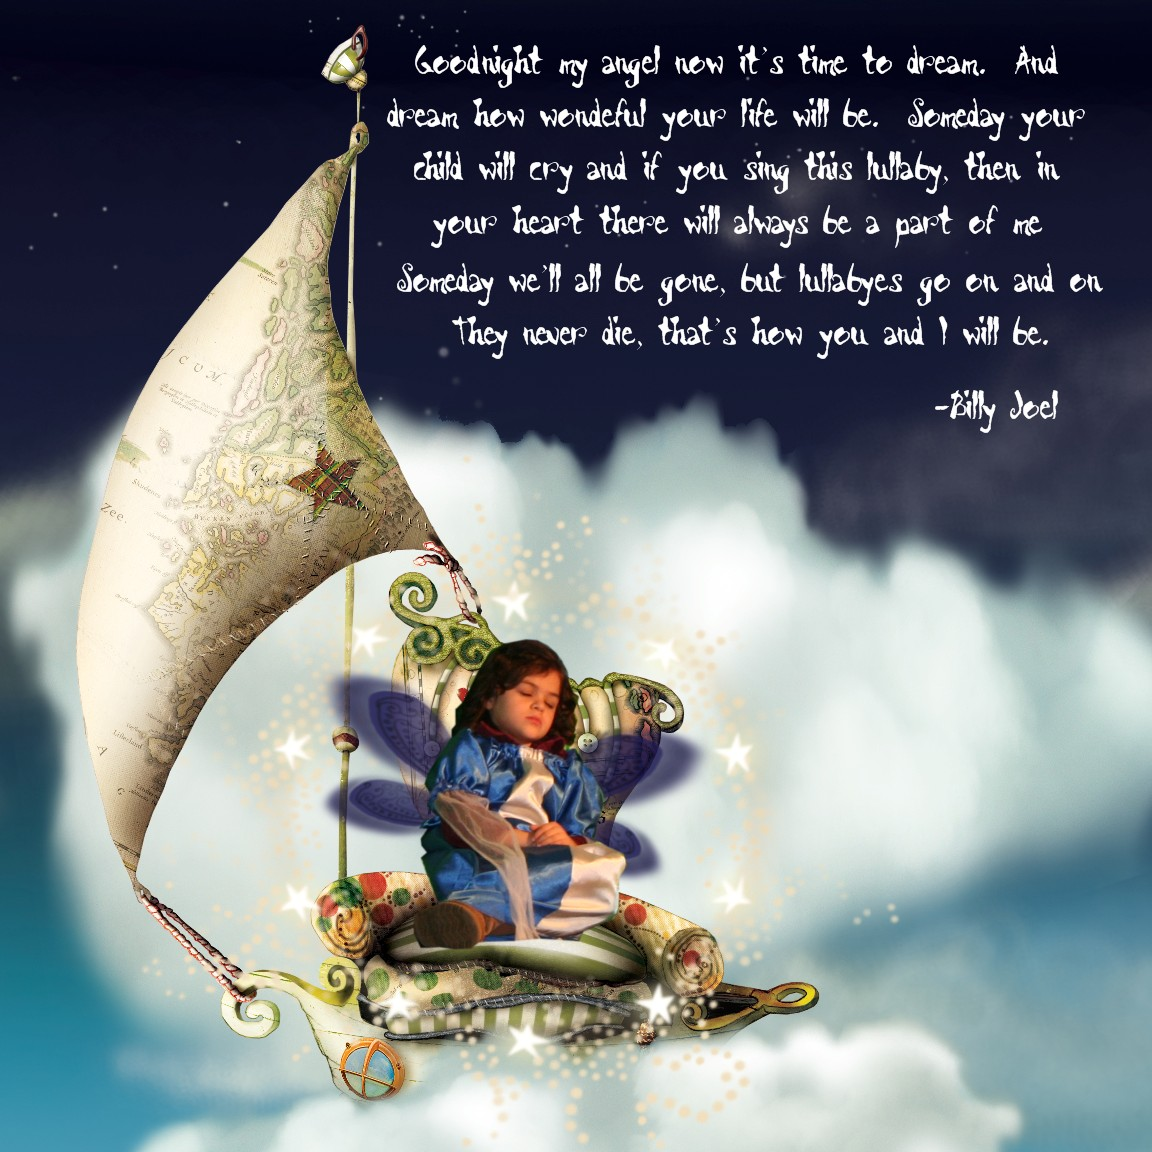 Quotes angel goodnight my Good Night